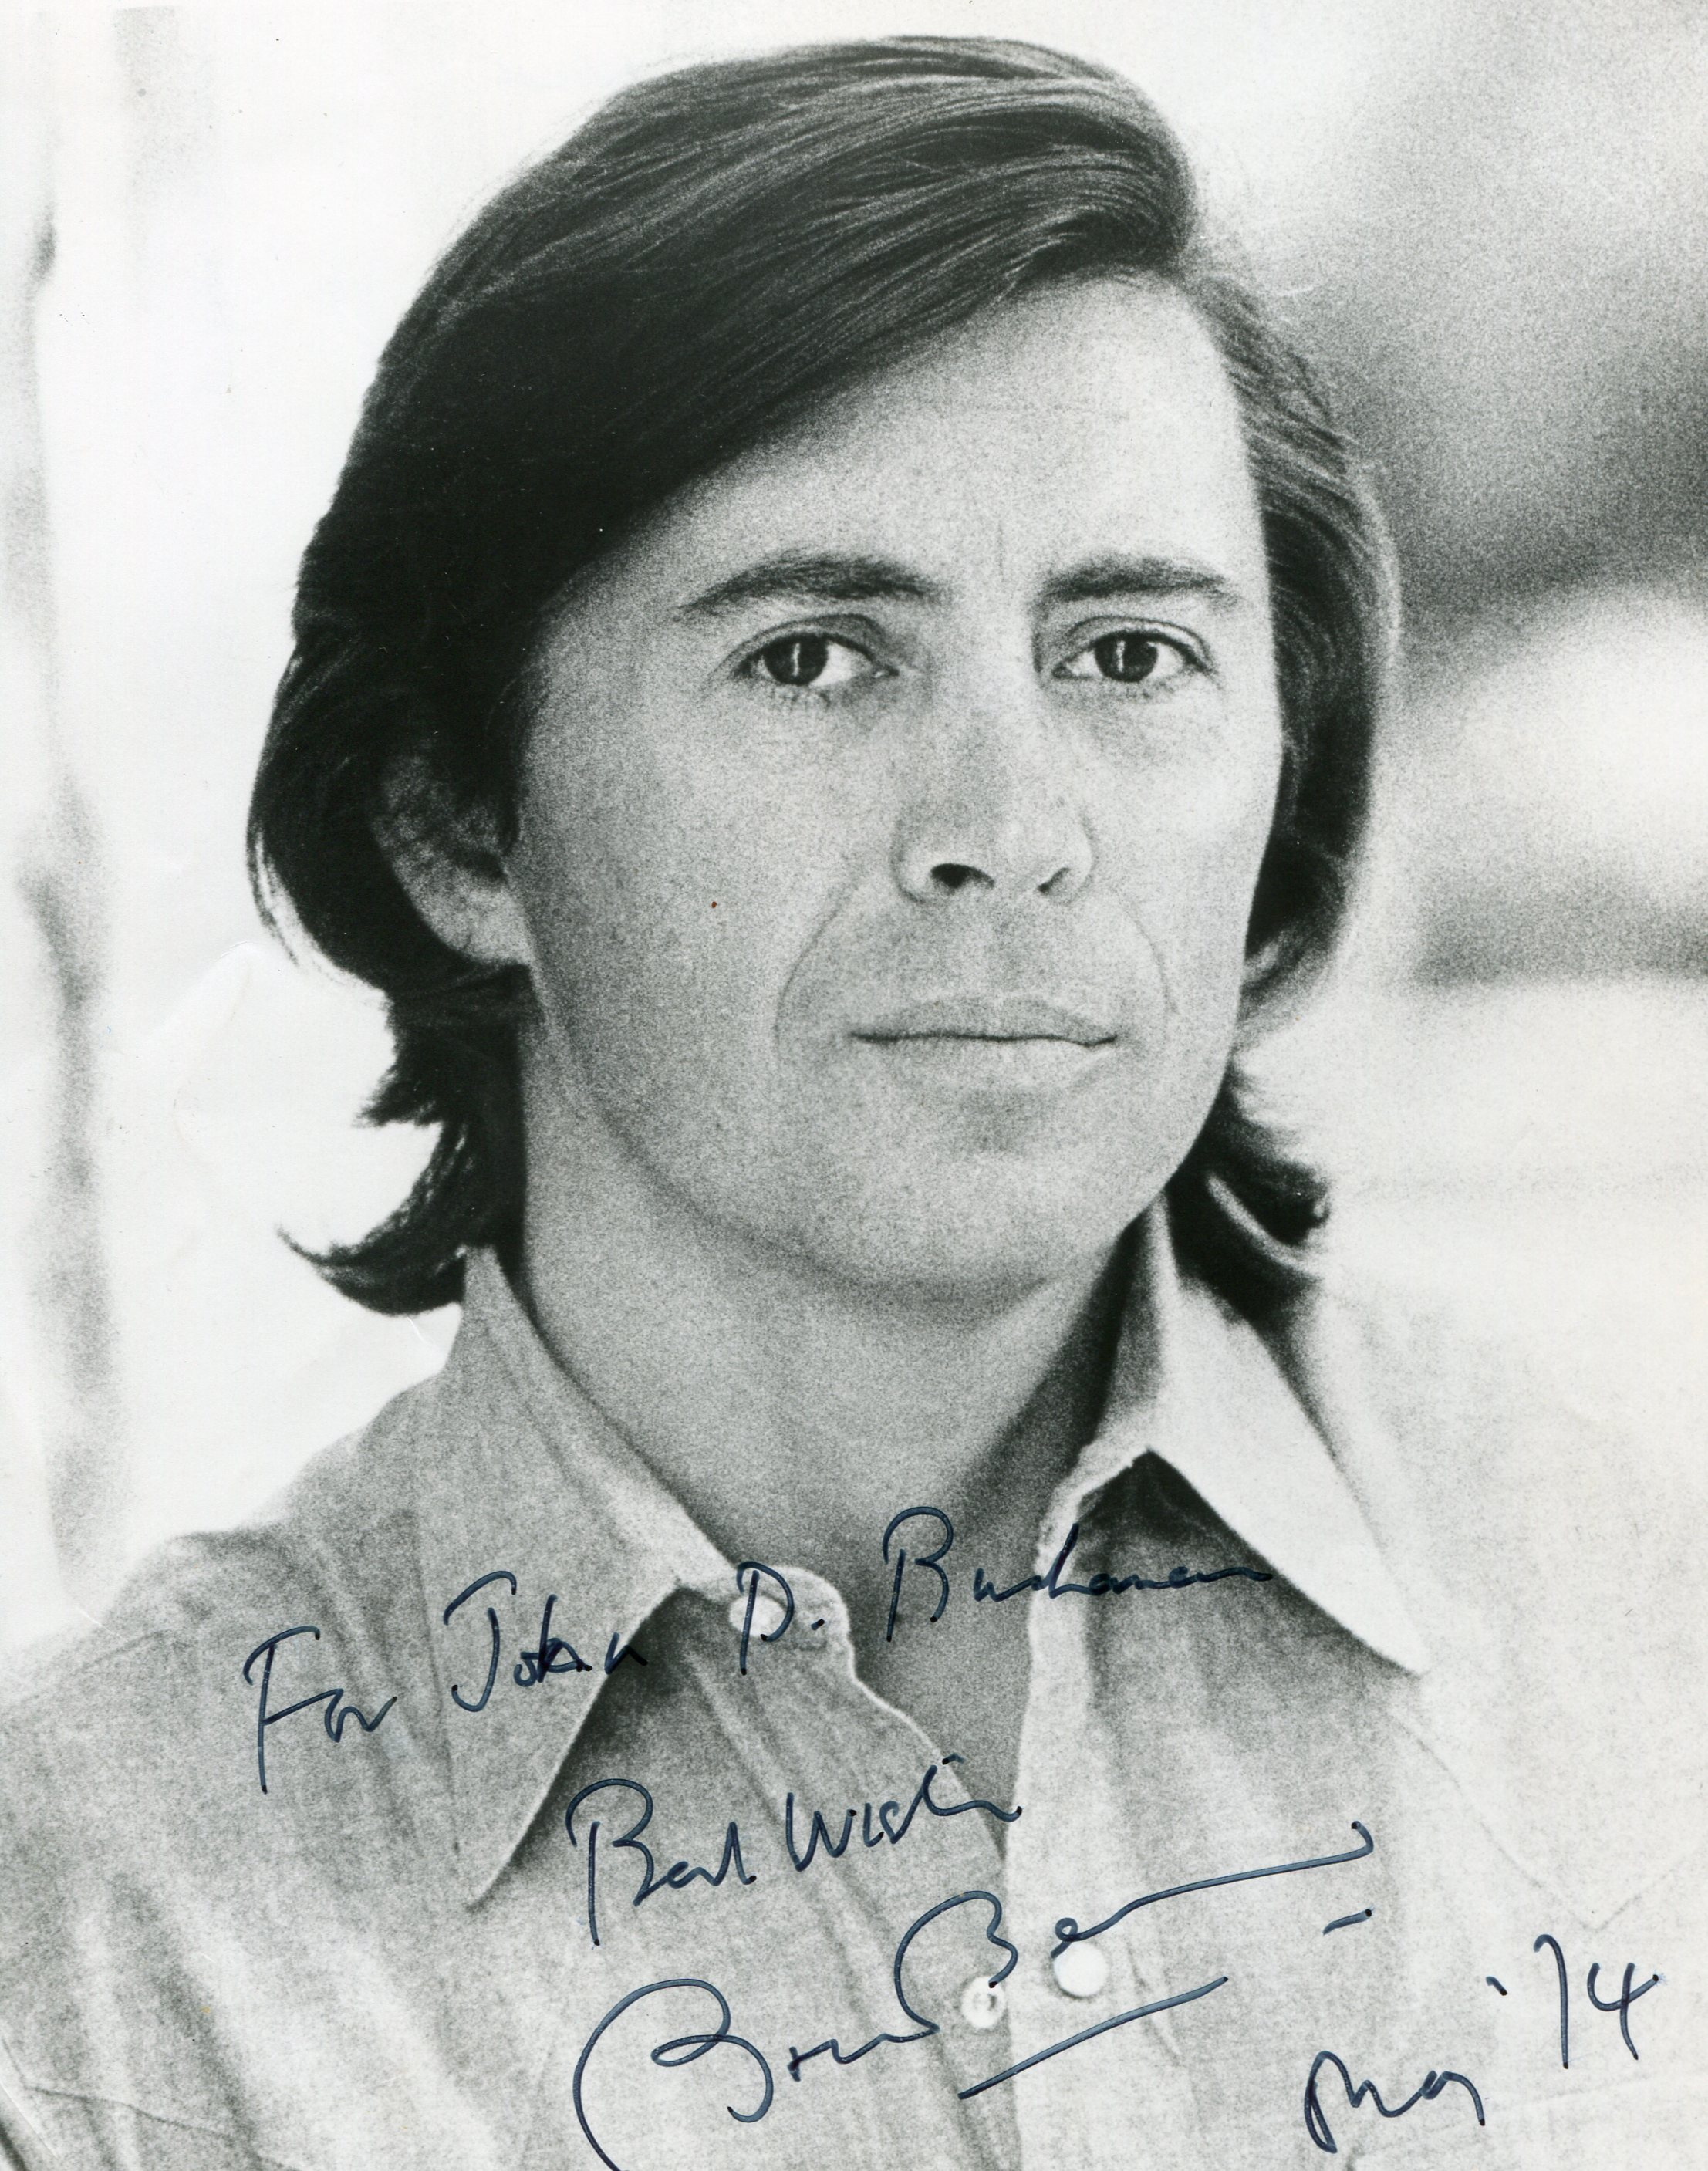 Brian-Bedford -